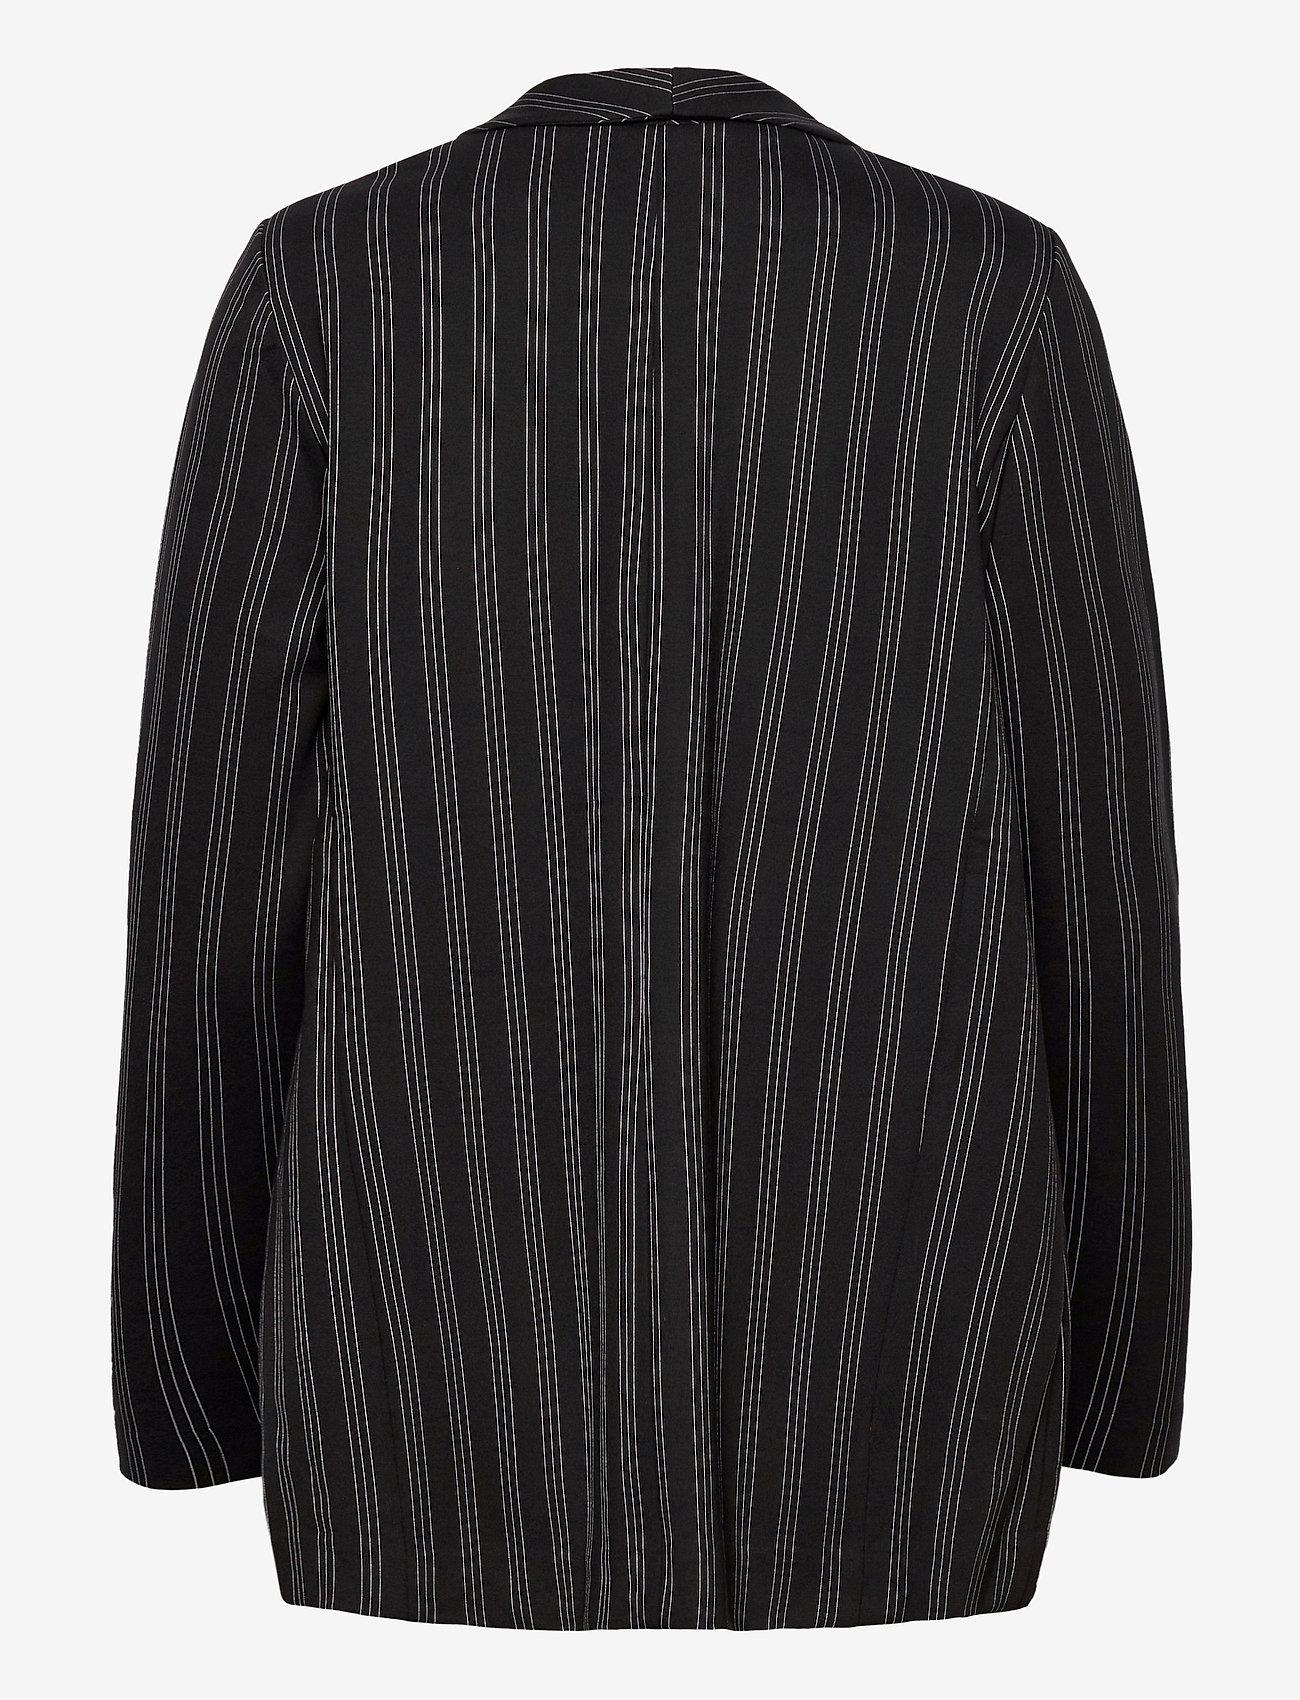 ICHI - IHRUTI BL 6 - oversize blazers - black - 1